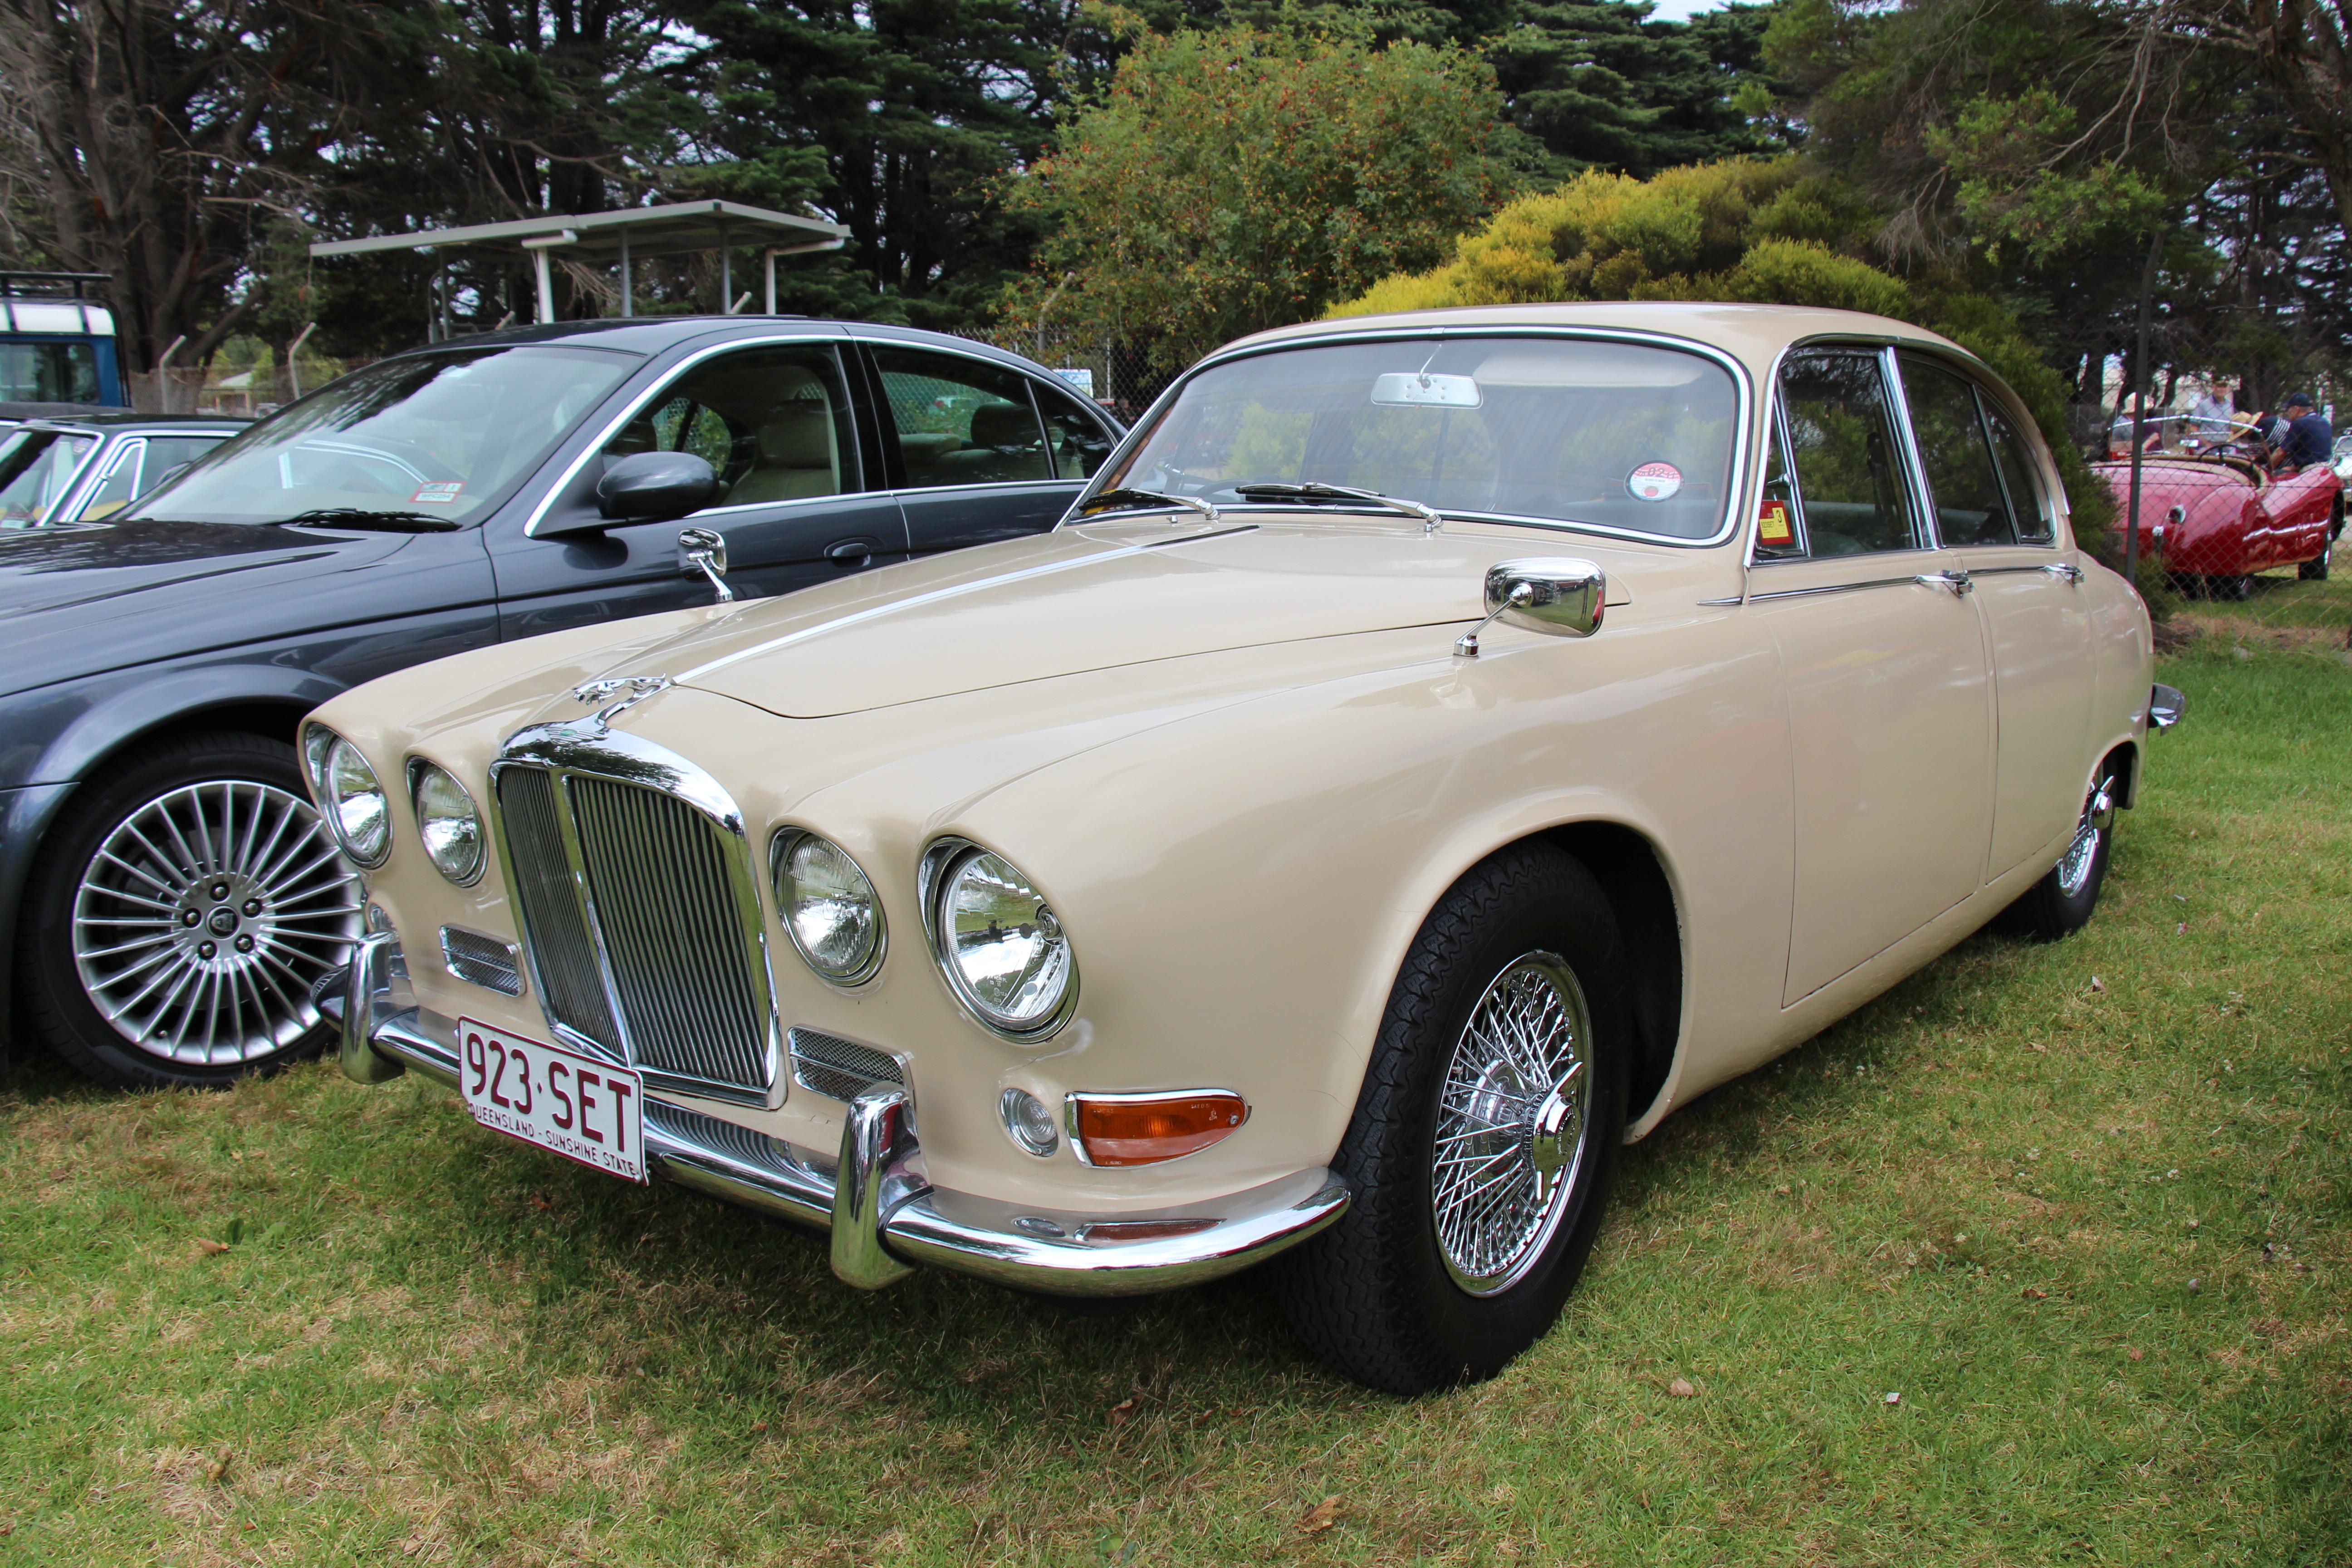 1967 Jaguar E Type Wiring Diagram Schematics Diagrams Vw Beetle Color Also Xke Alfa Romeo Spider Volkswagen